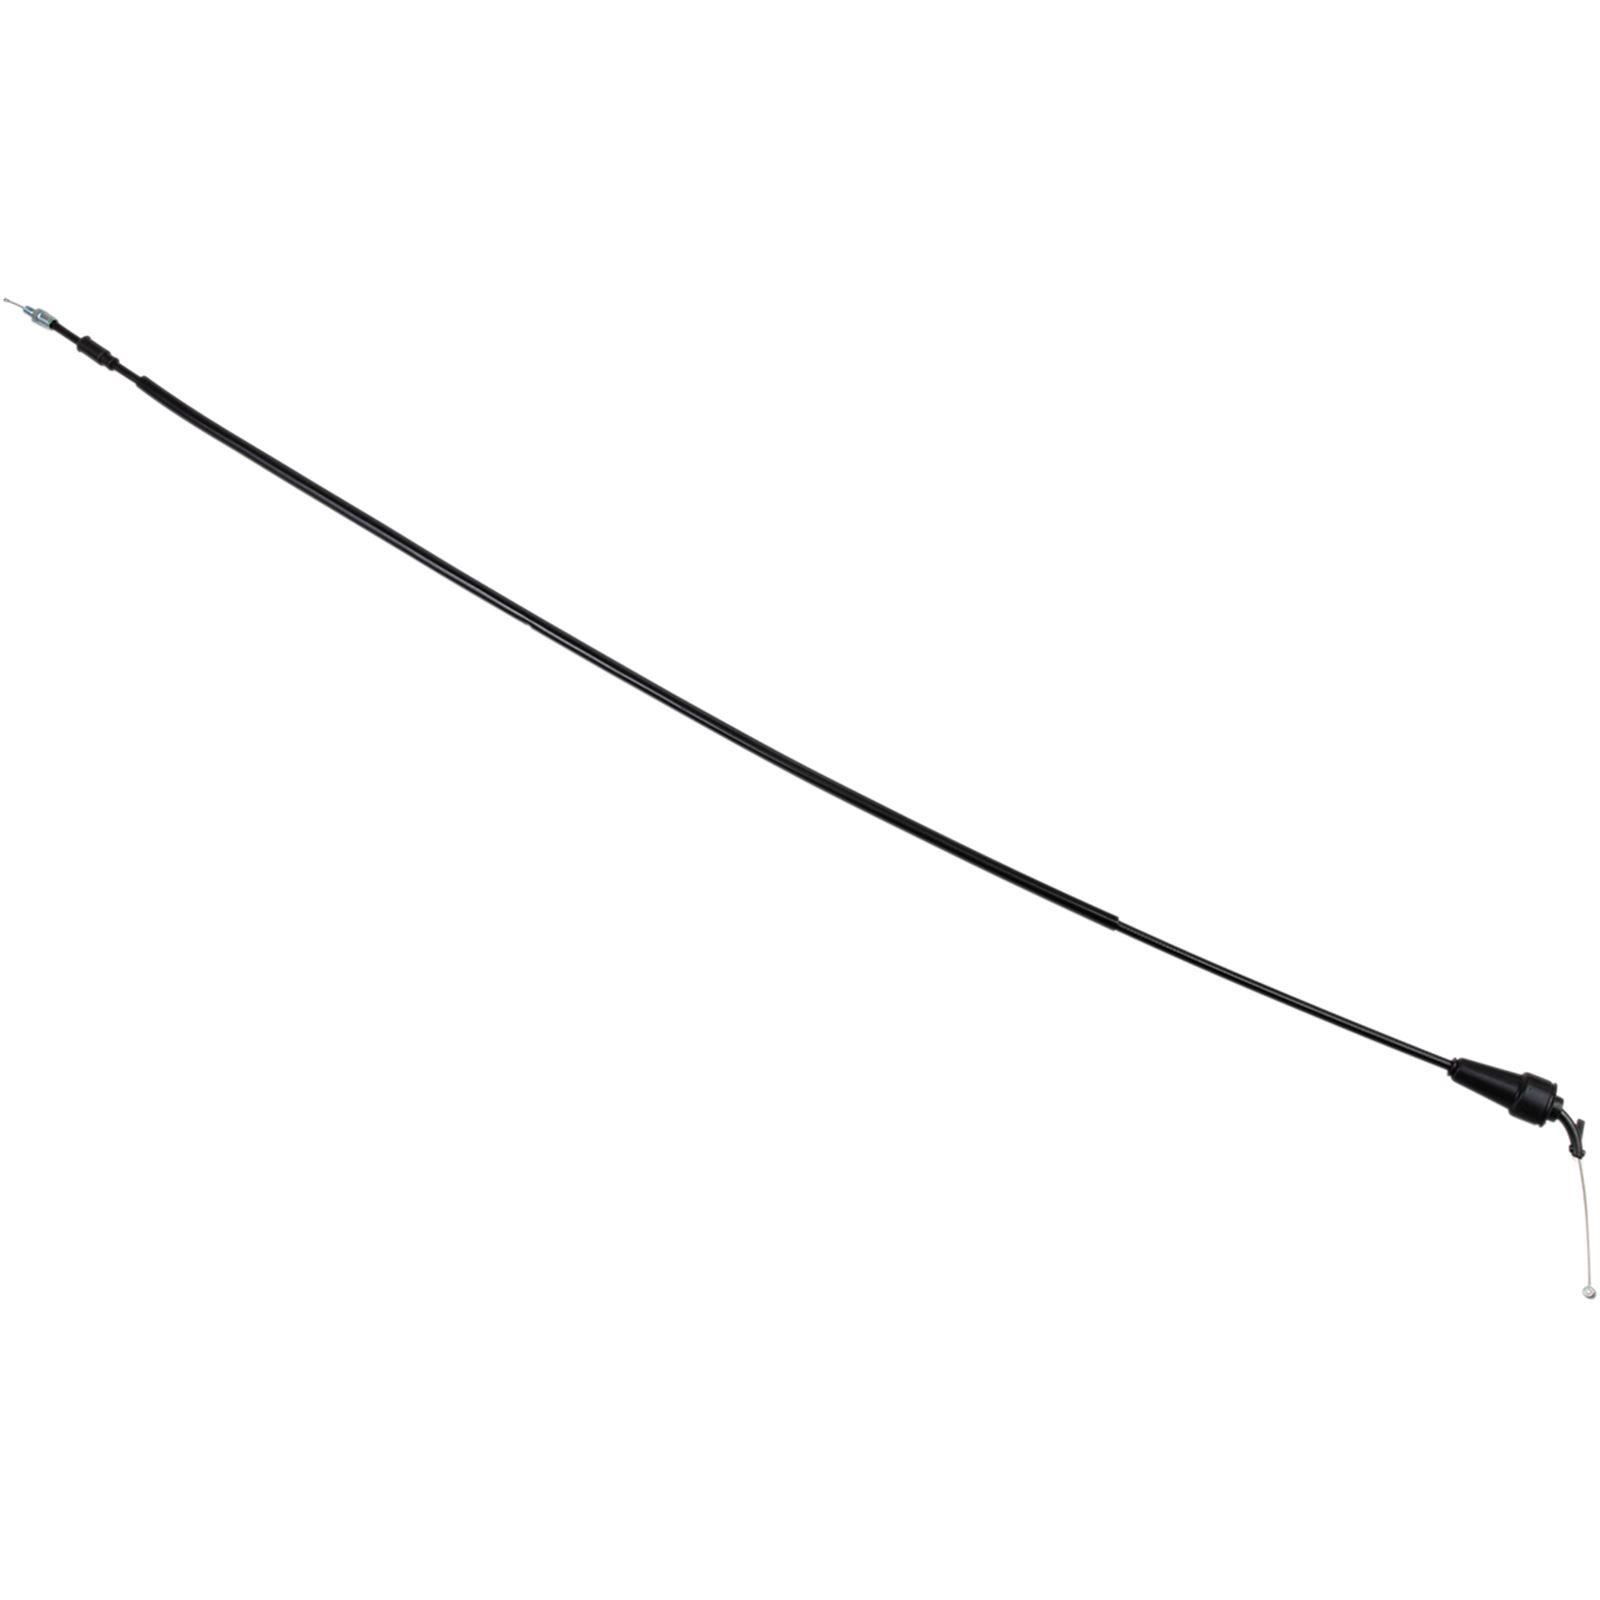 Motion Pro Mp Cable Thr Ktm/Hus +3